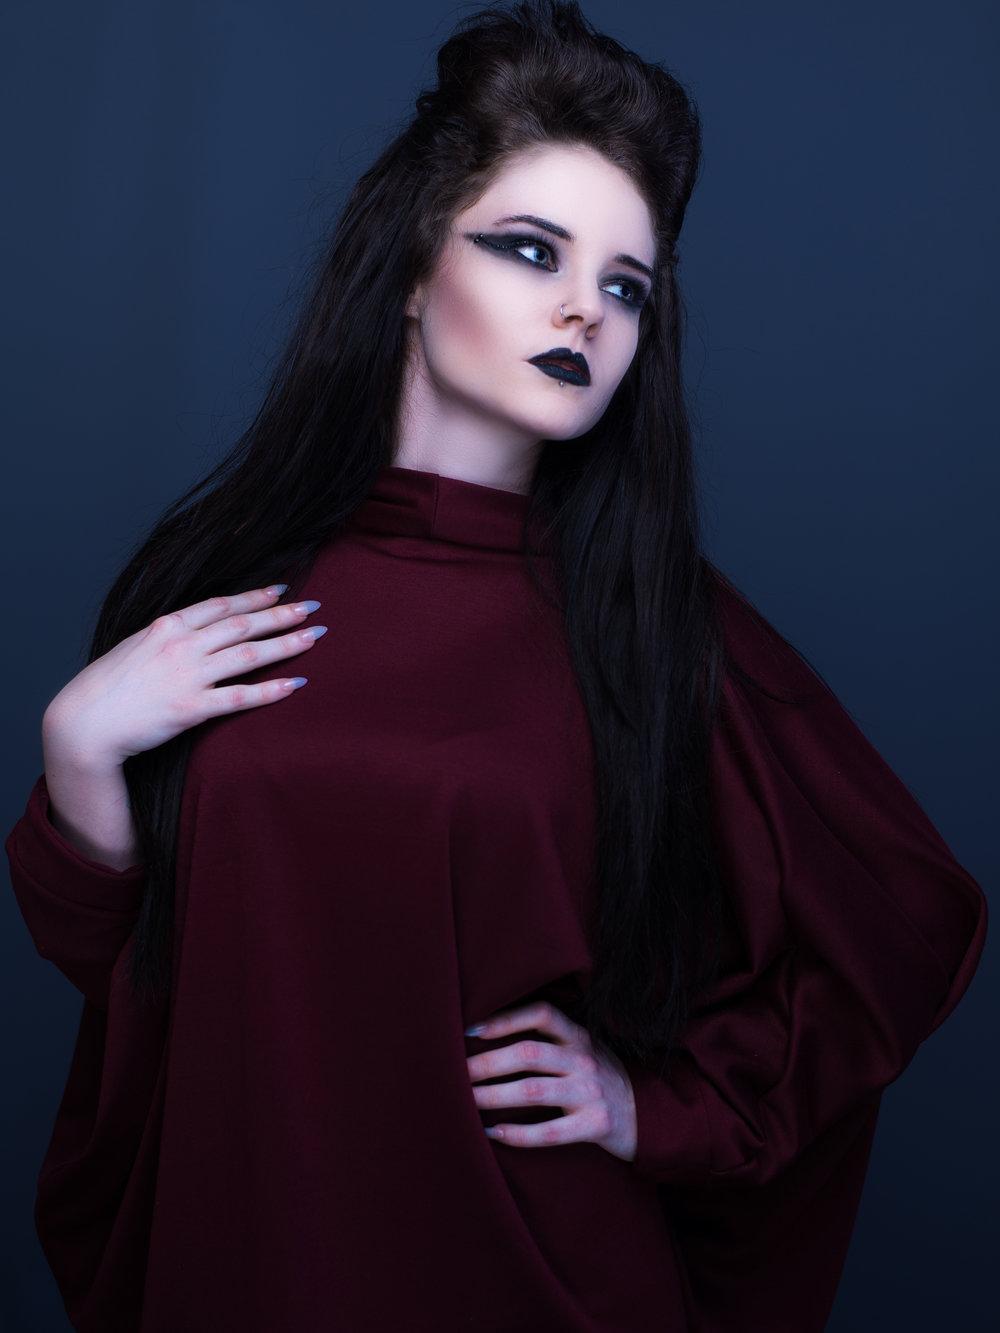 zaramia-ava-zaramiaava-leeds-fashion-designer-ethical-sustainable-tailored-minimalist-aya-burgundy-black-obi-belt-dress-versatile-drape-cowl-styling-studio-womenswear-models-photoshoot-13